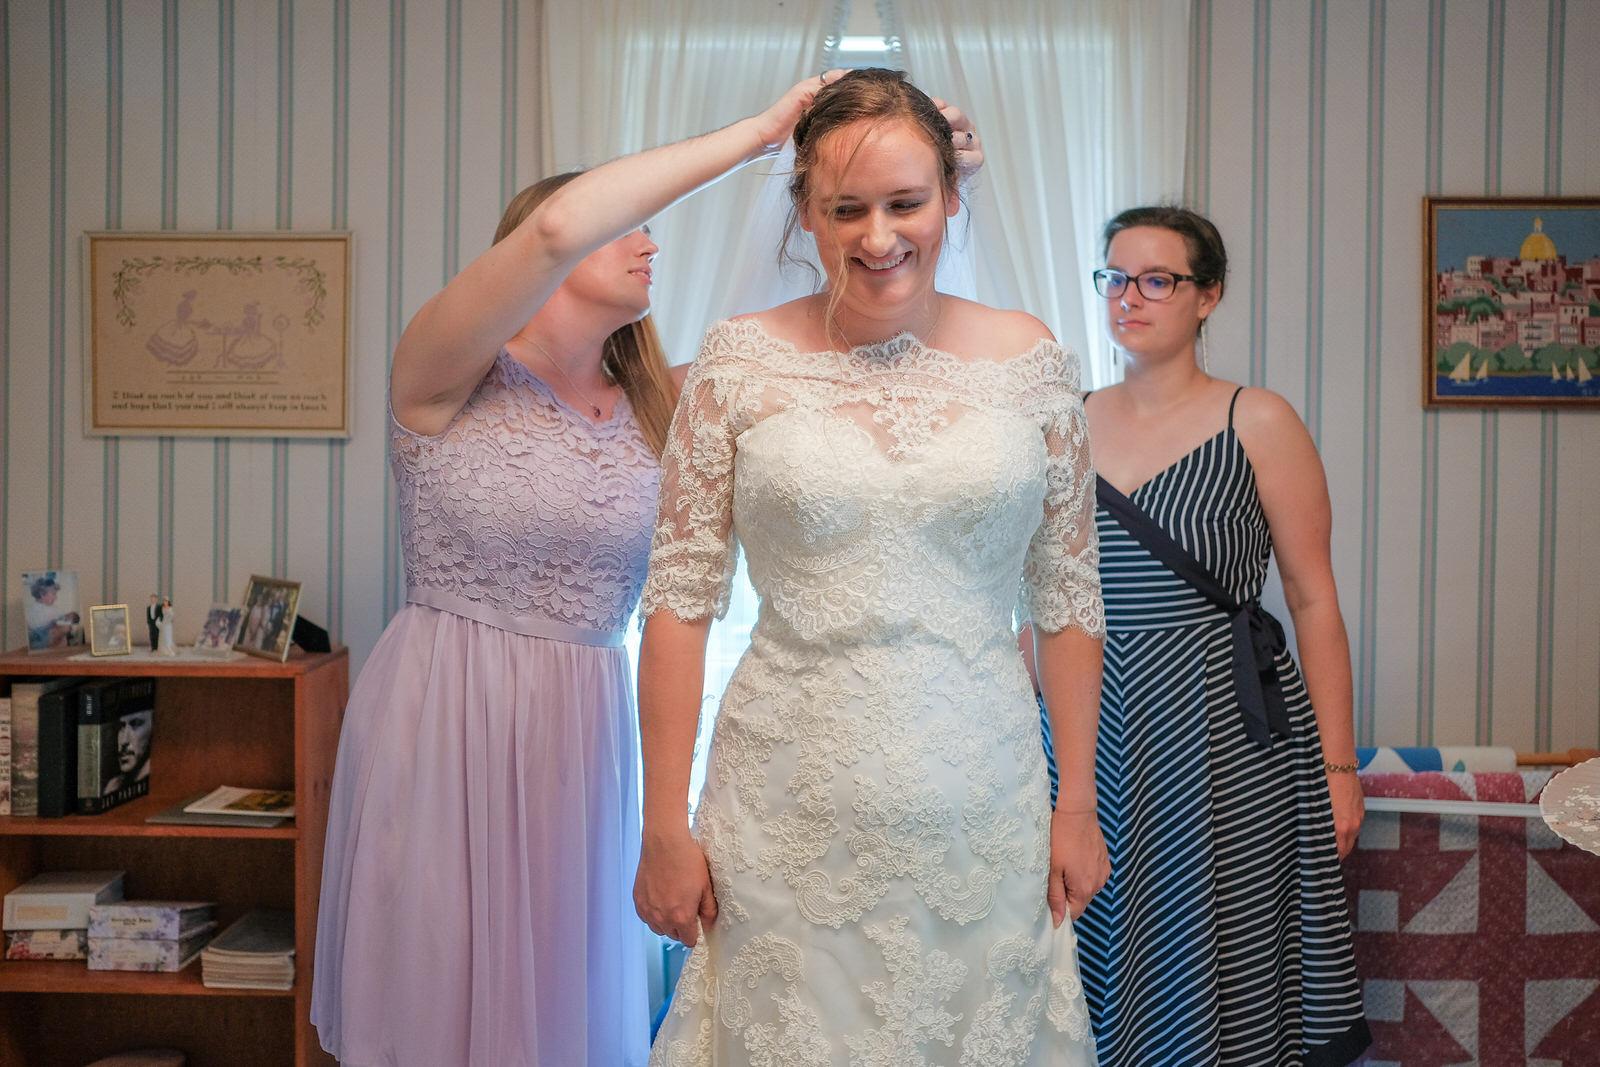 candid-vermont-wedding-photography-292.jpg